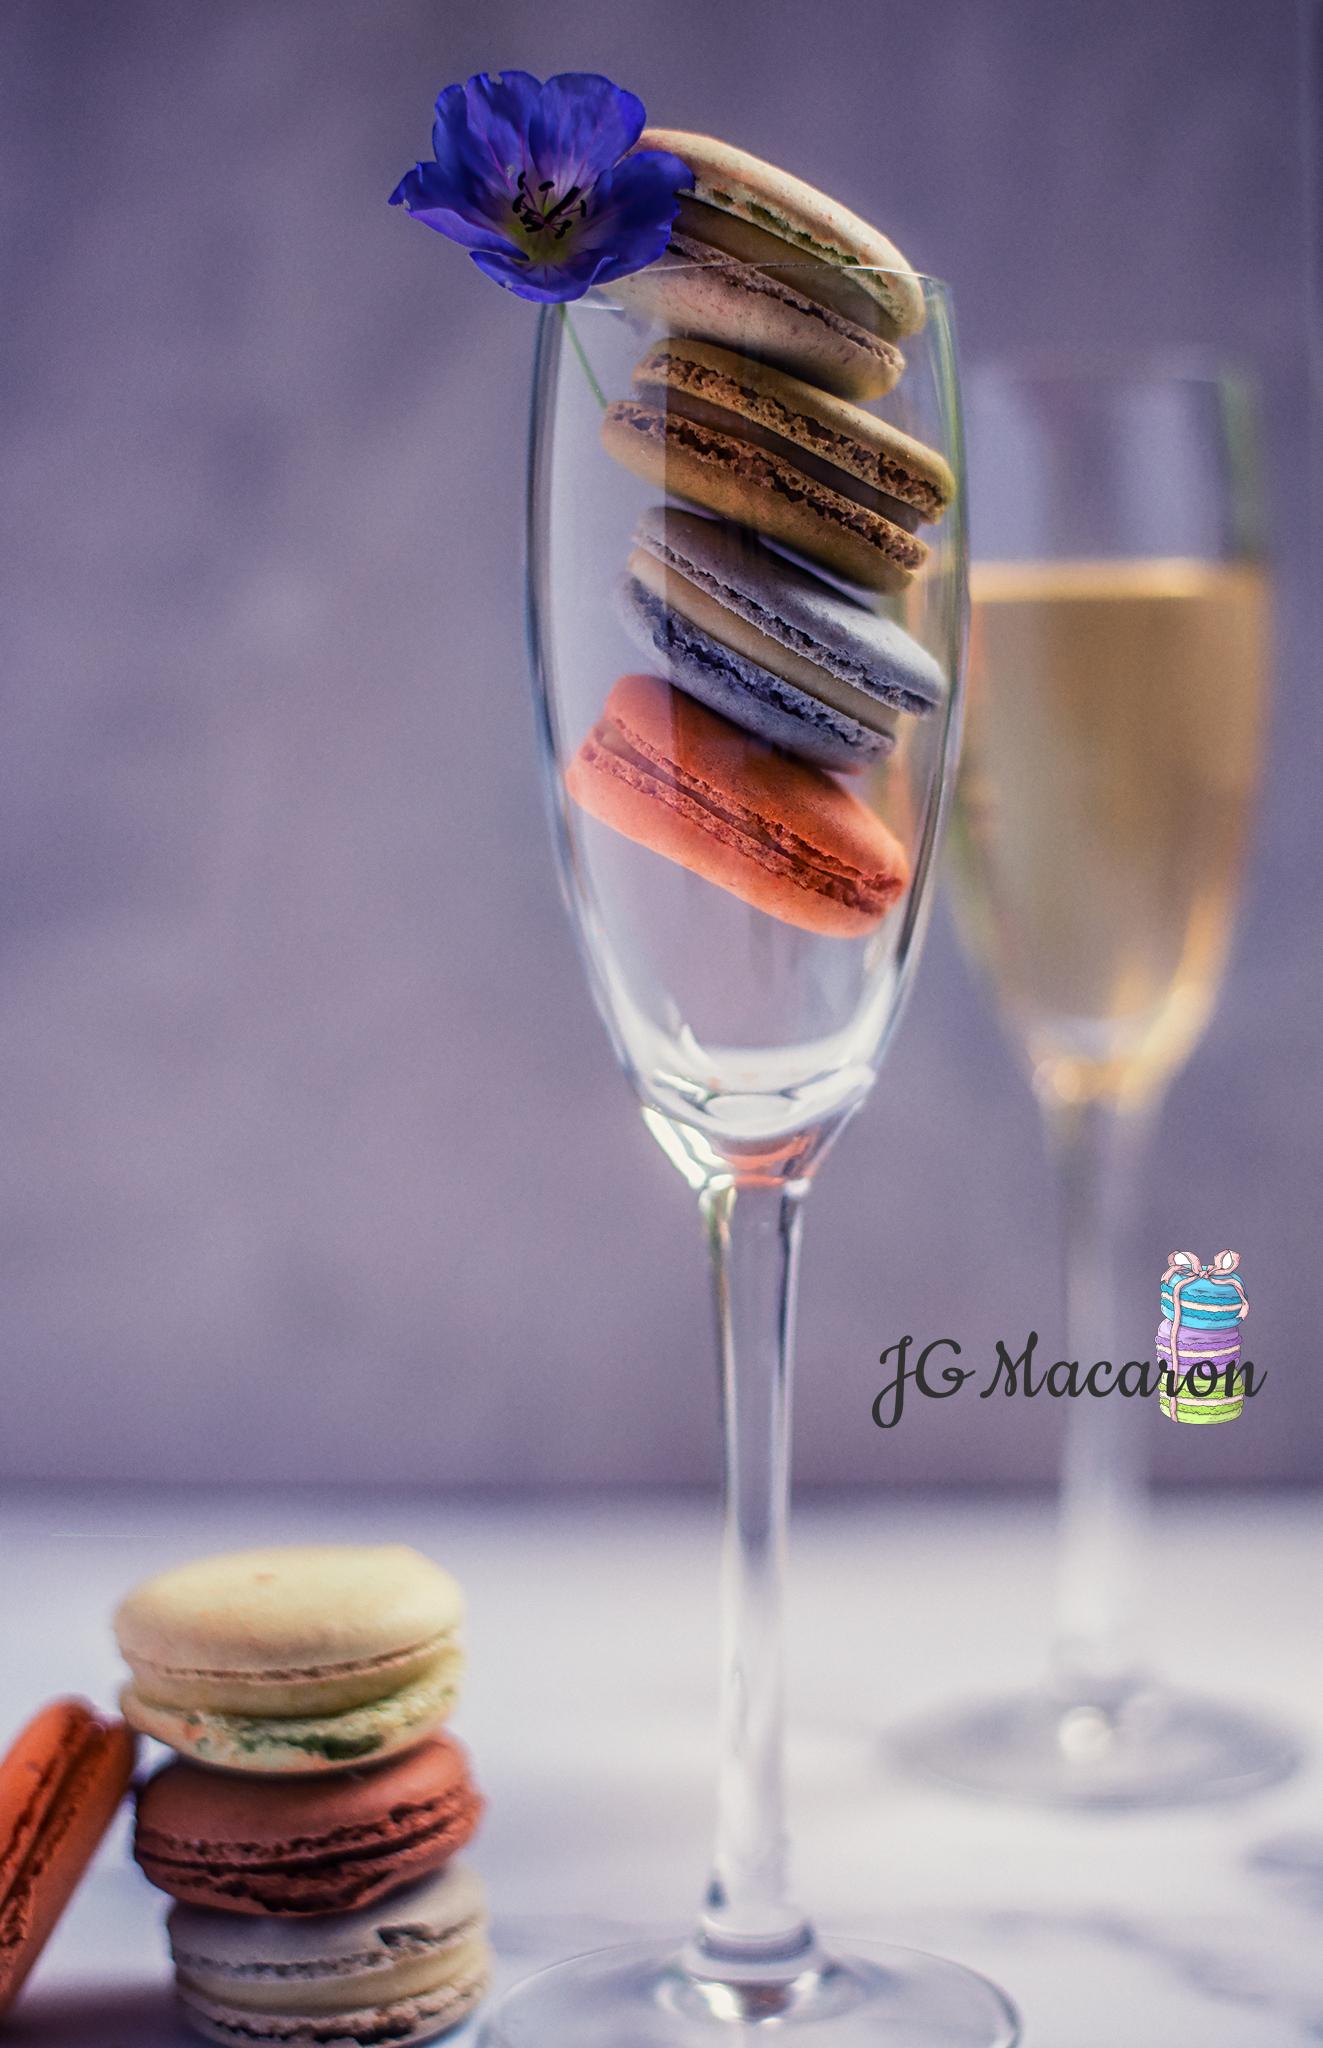 JG Macaron